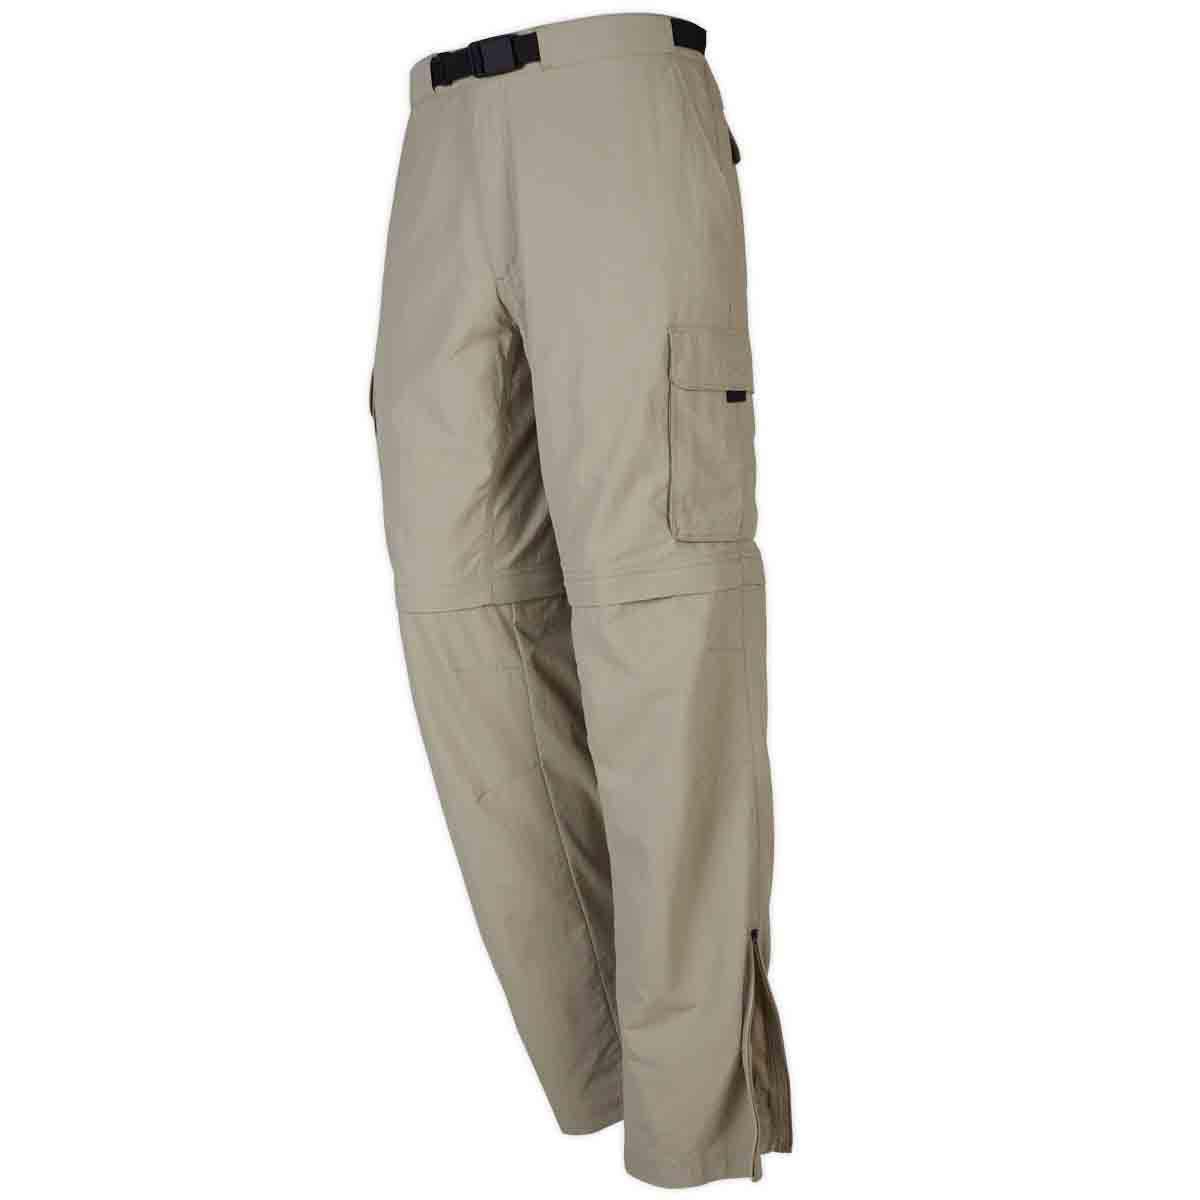 EMS Profile Zip-off Pants